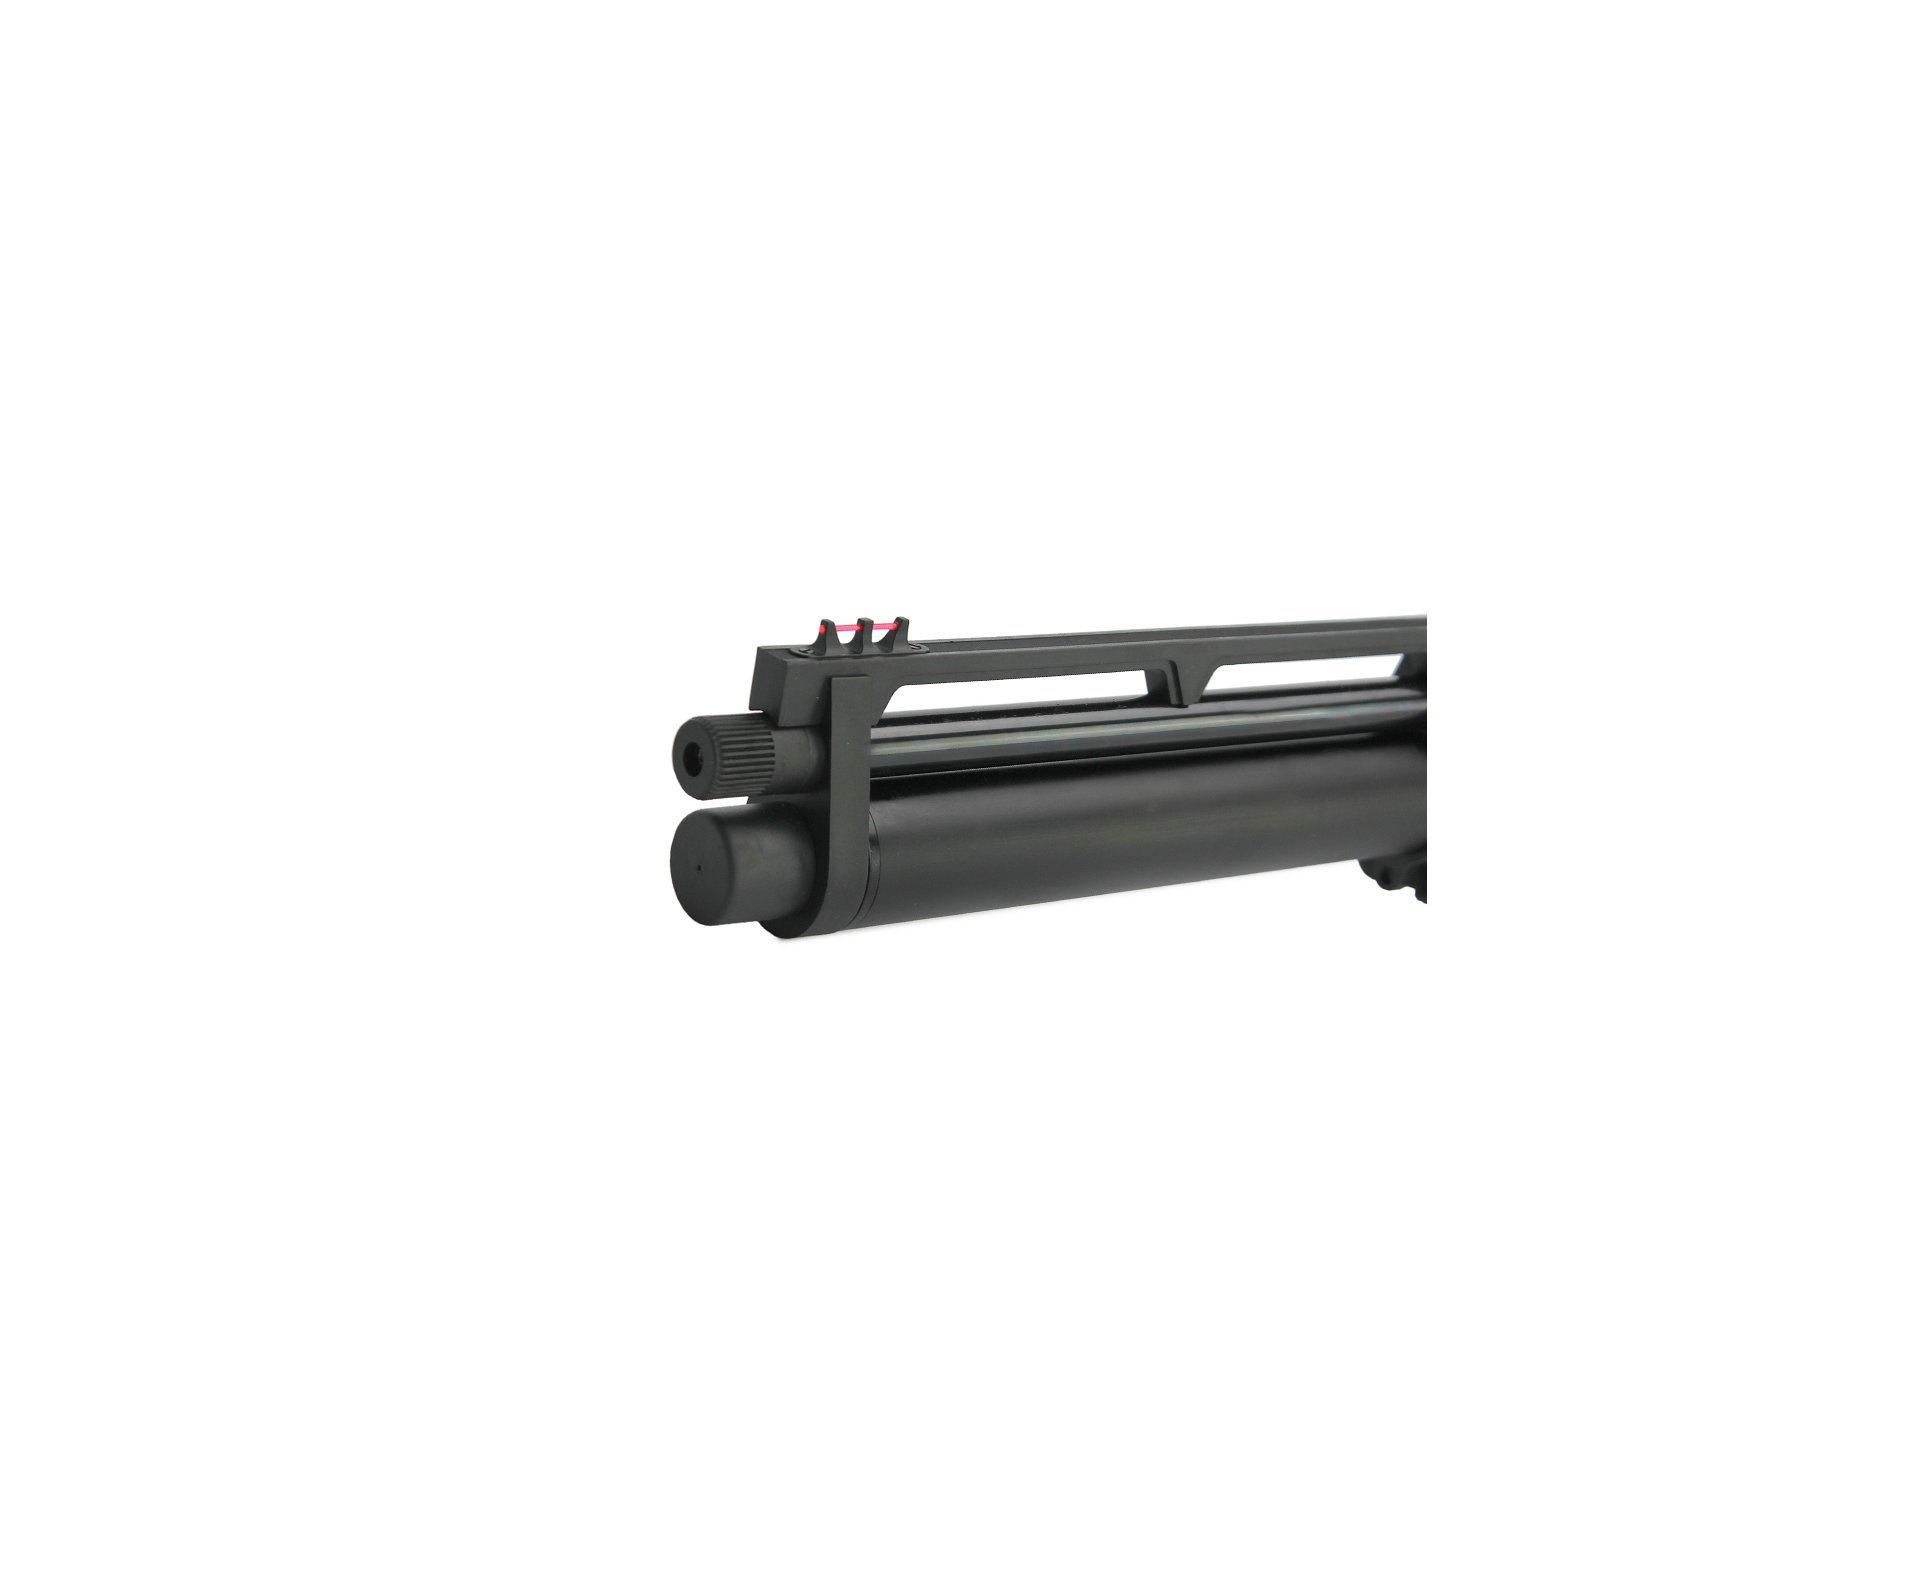 Carabina De Pressão Pcp Rossi R8 Black 5,5mm 8 Tiros 350 M/s